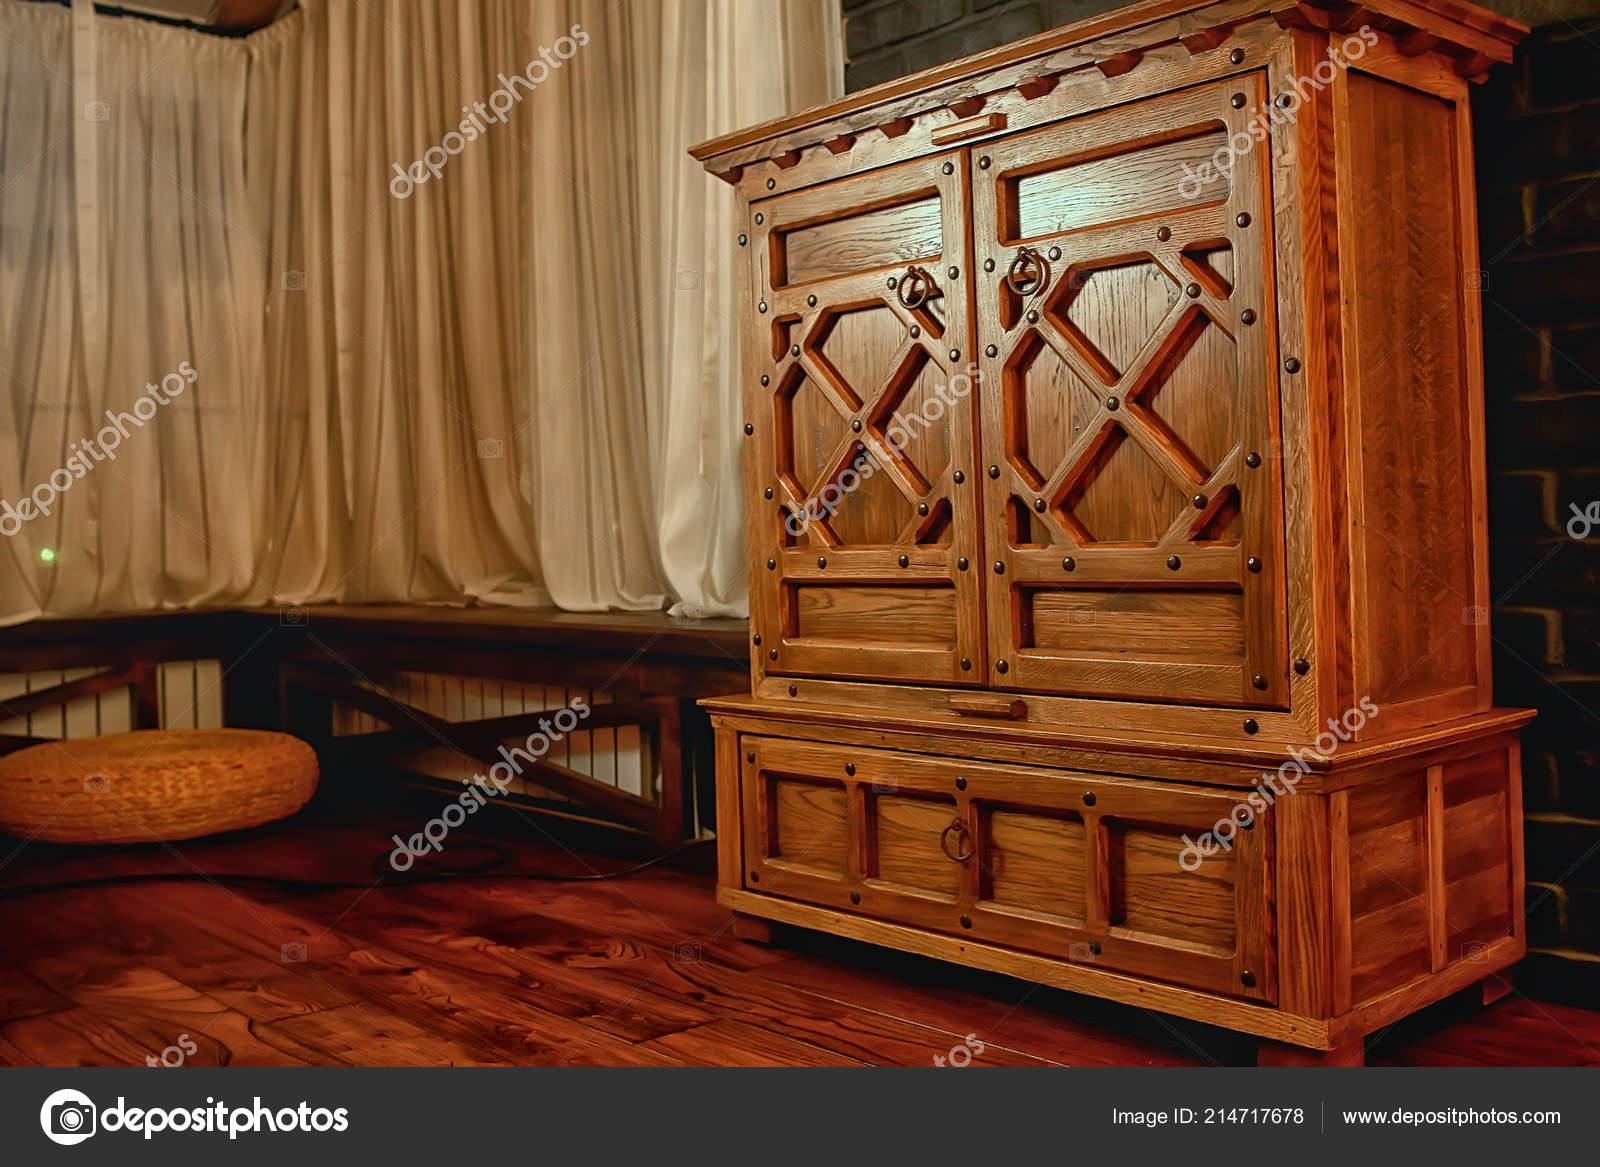 Genial Antike Eiche Kommode Vintage Möbel U2014 Stockfoto